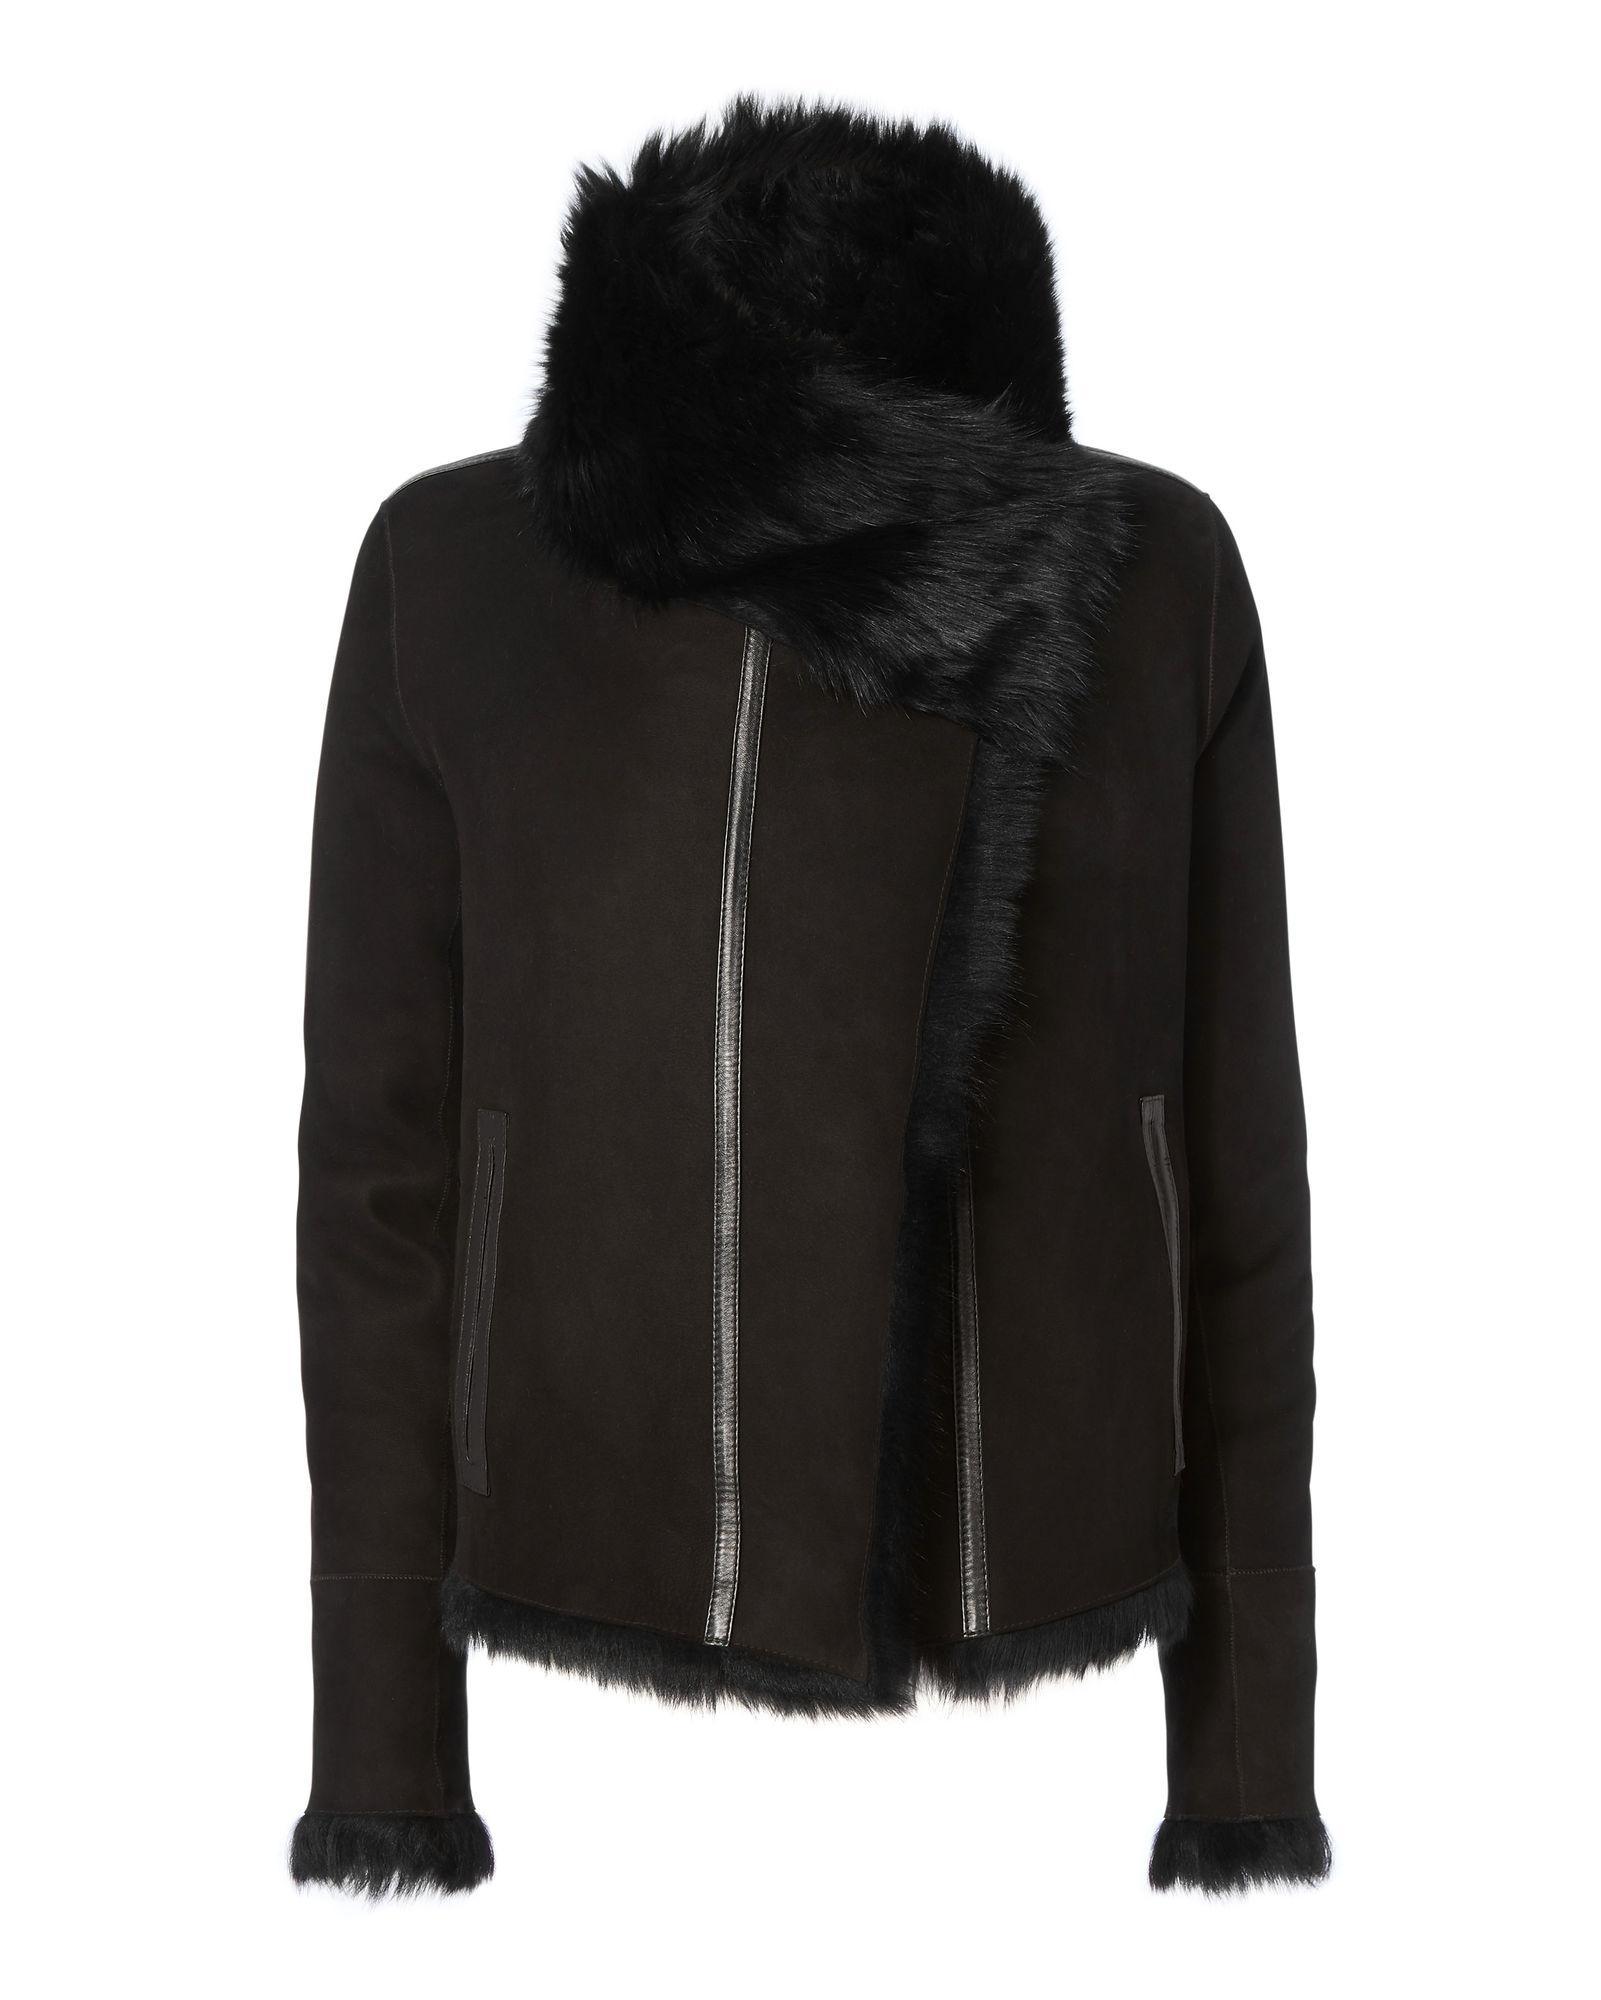 Yves Salomon Reversible Shearling Moto Jacket In Black